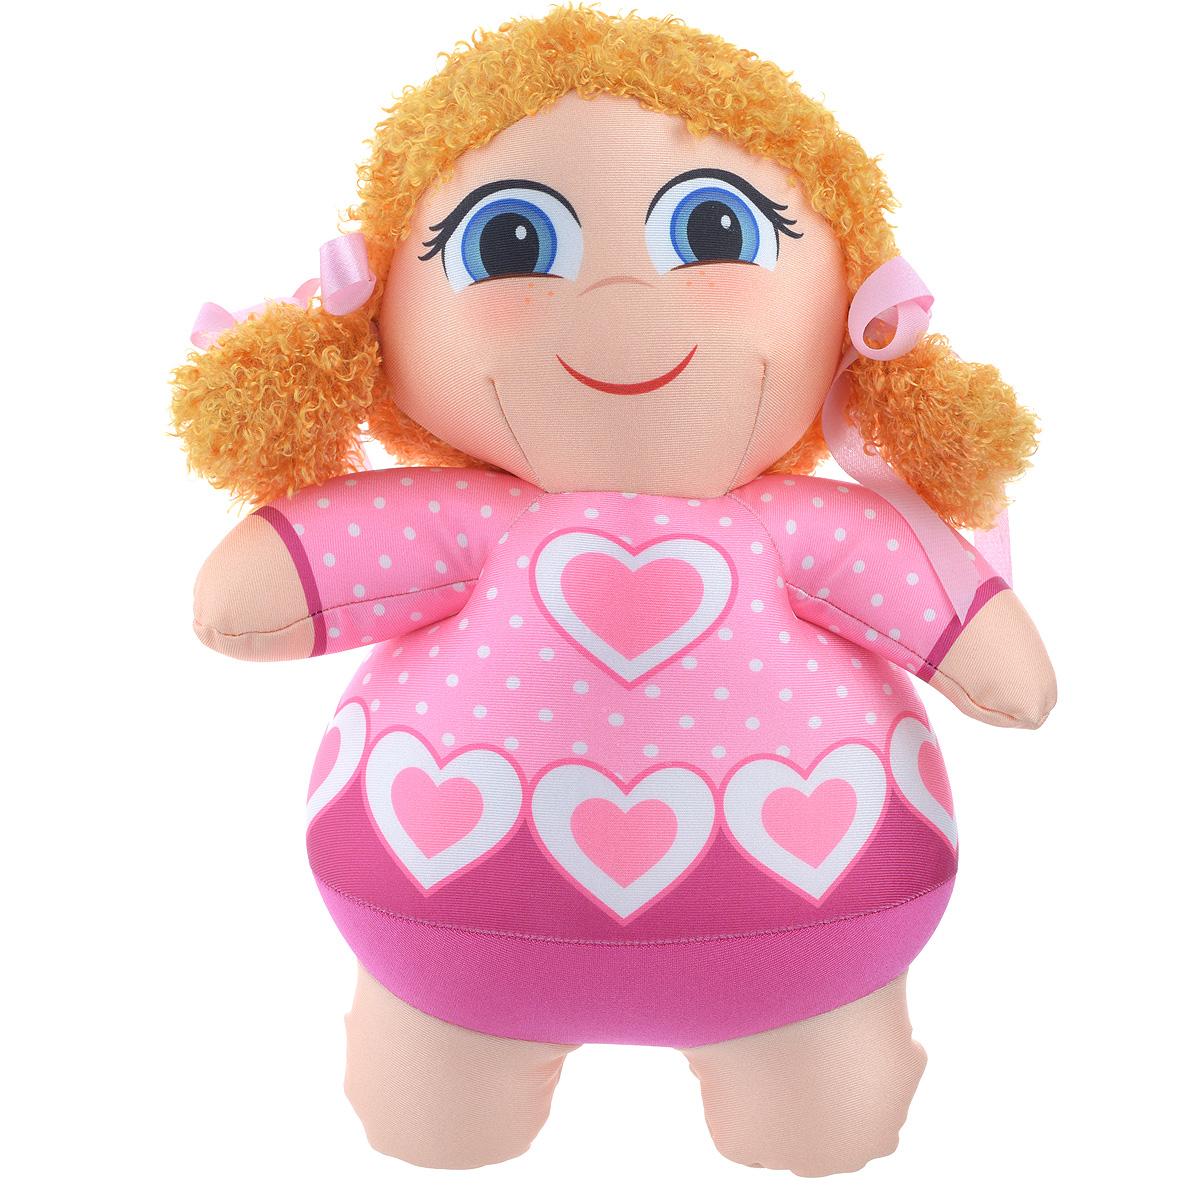 Игрушка-антистресс СмолТойс Кукла Анюта, 30 см игрушка антистресс смолтойс кукла анюта 30 см